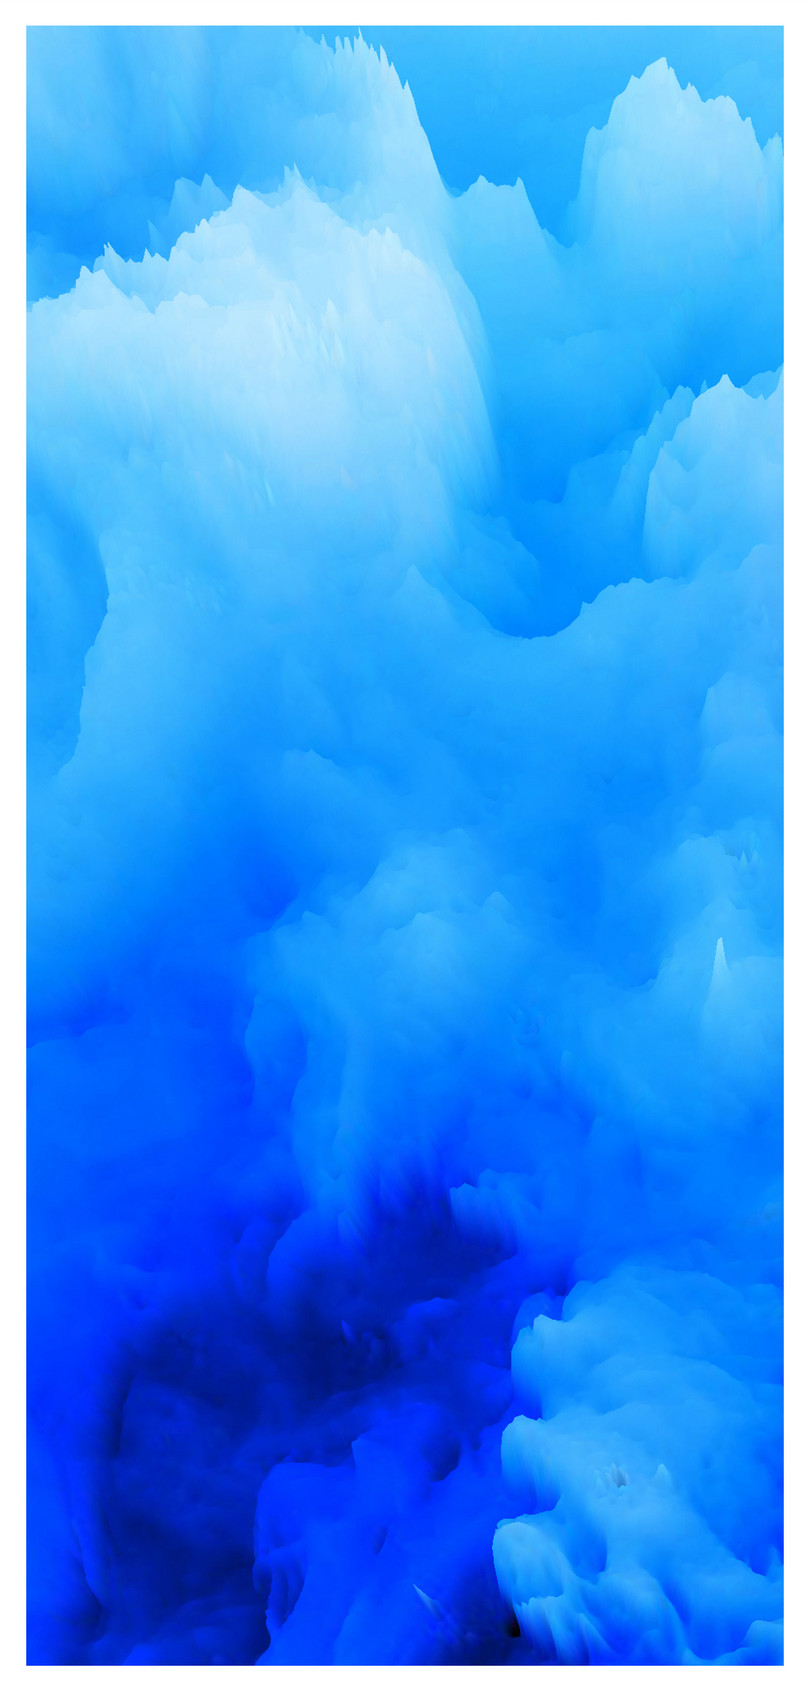 Wallpaper Ponsel Warna Asap - Background Asap Keren Warna Warni - 808x1692  Wallpaper - Teahub.io